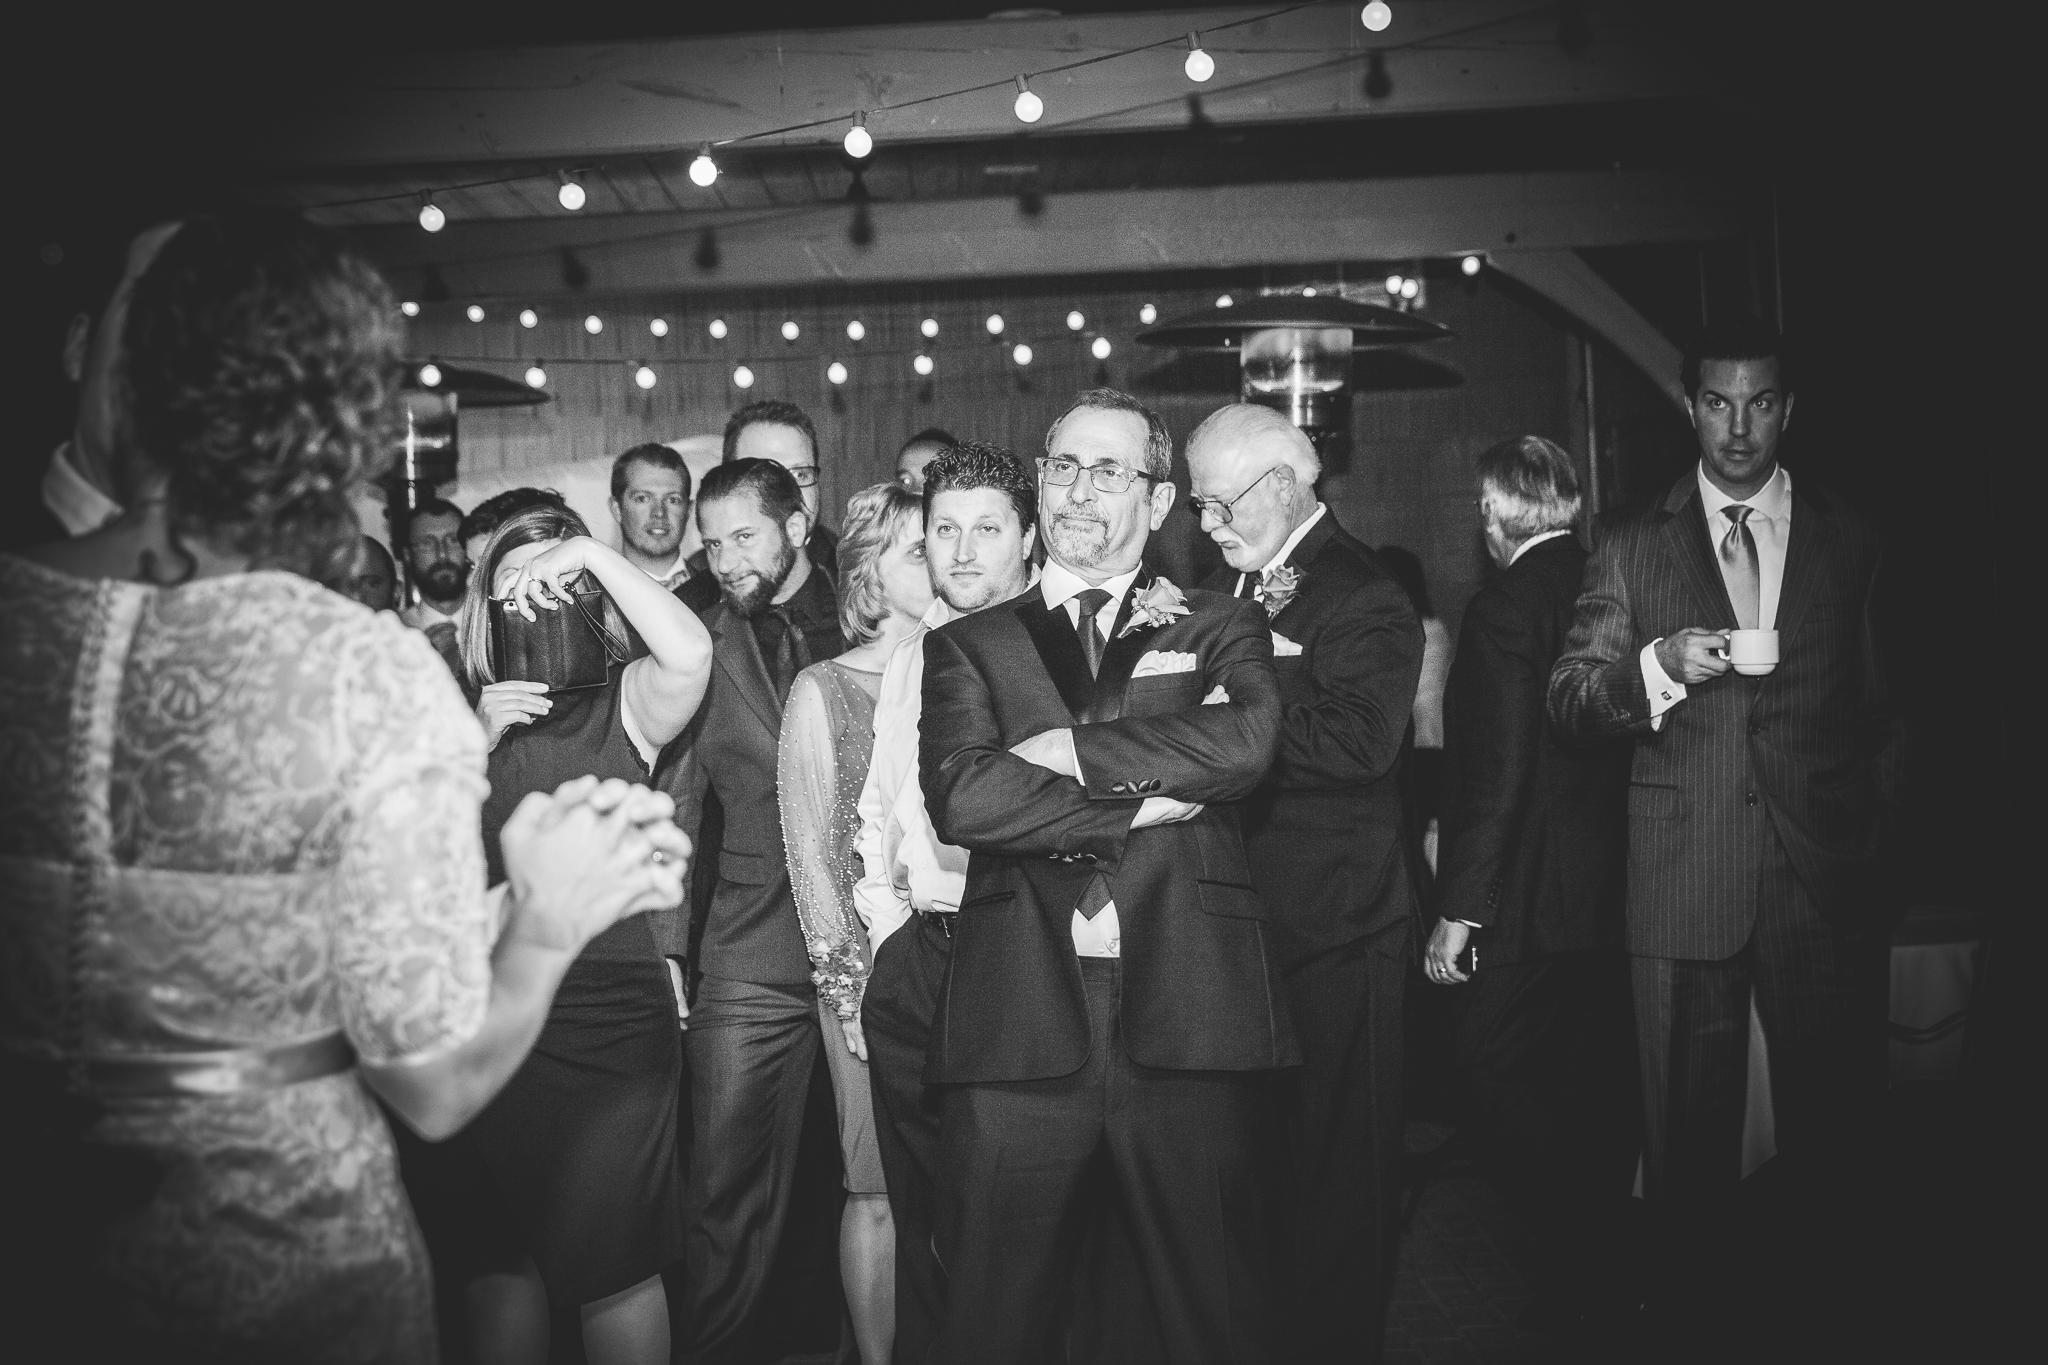 camuglia-whomstudio-chelsea_and_andy-nycphotographer-wedding-brooklyn-buffalo-timberlodge-116-0755.jpg